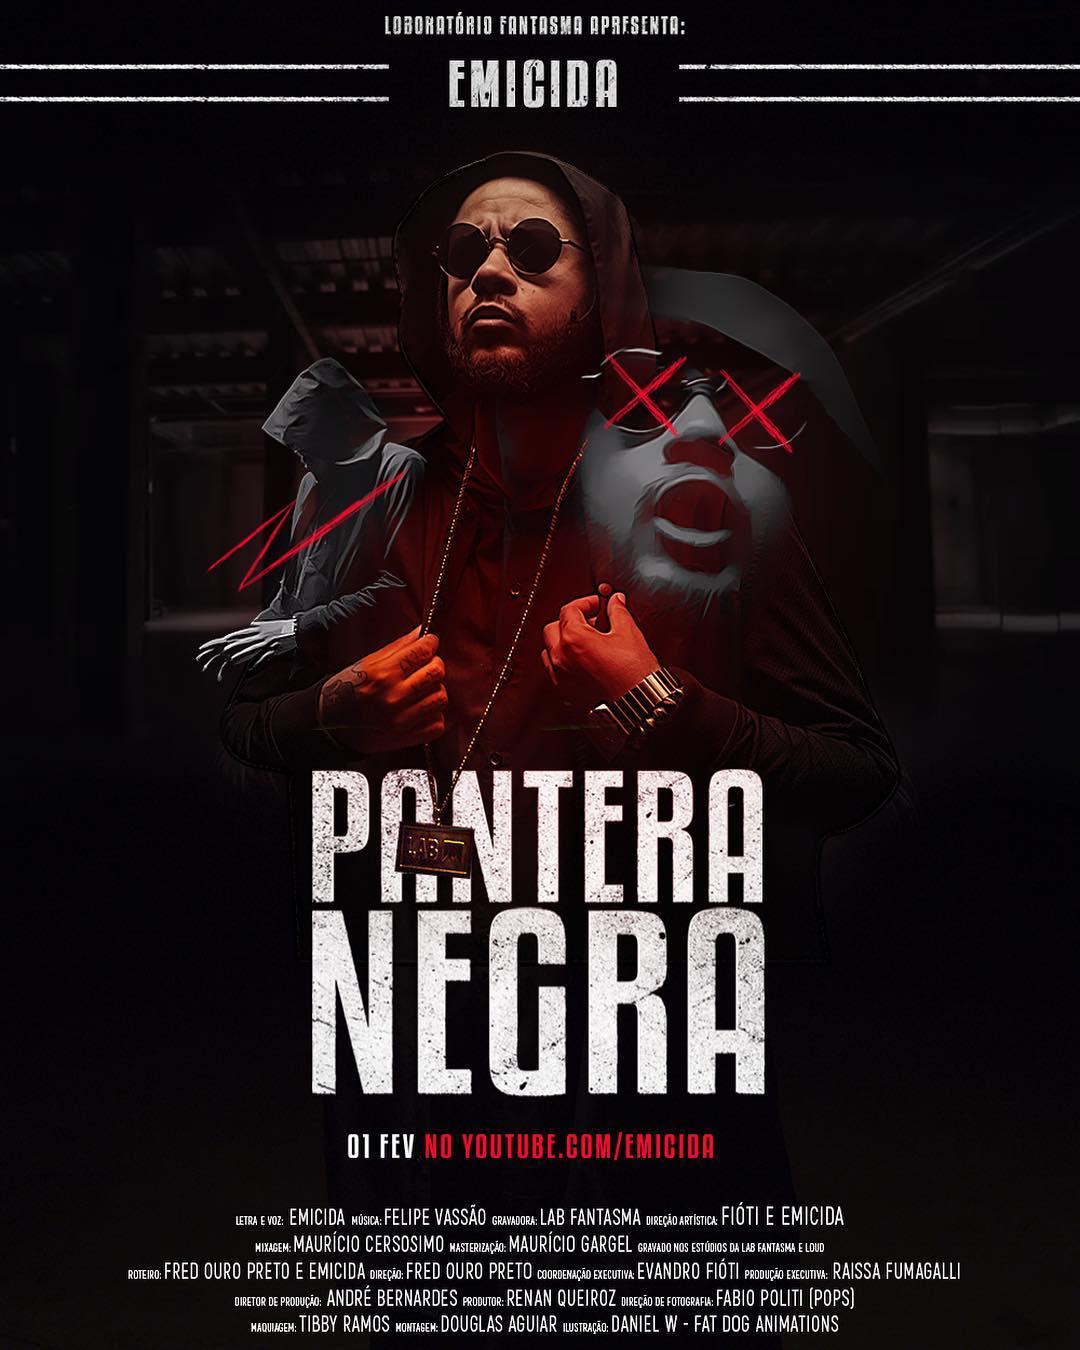 Emicida - Pantera Negra (clipe)